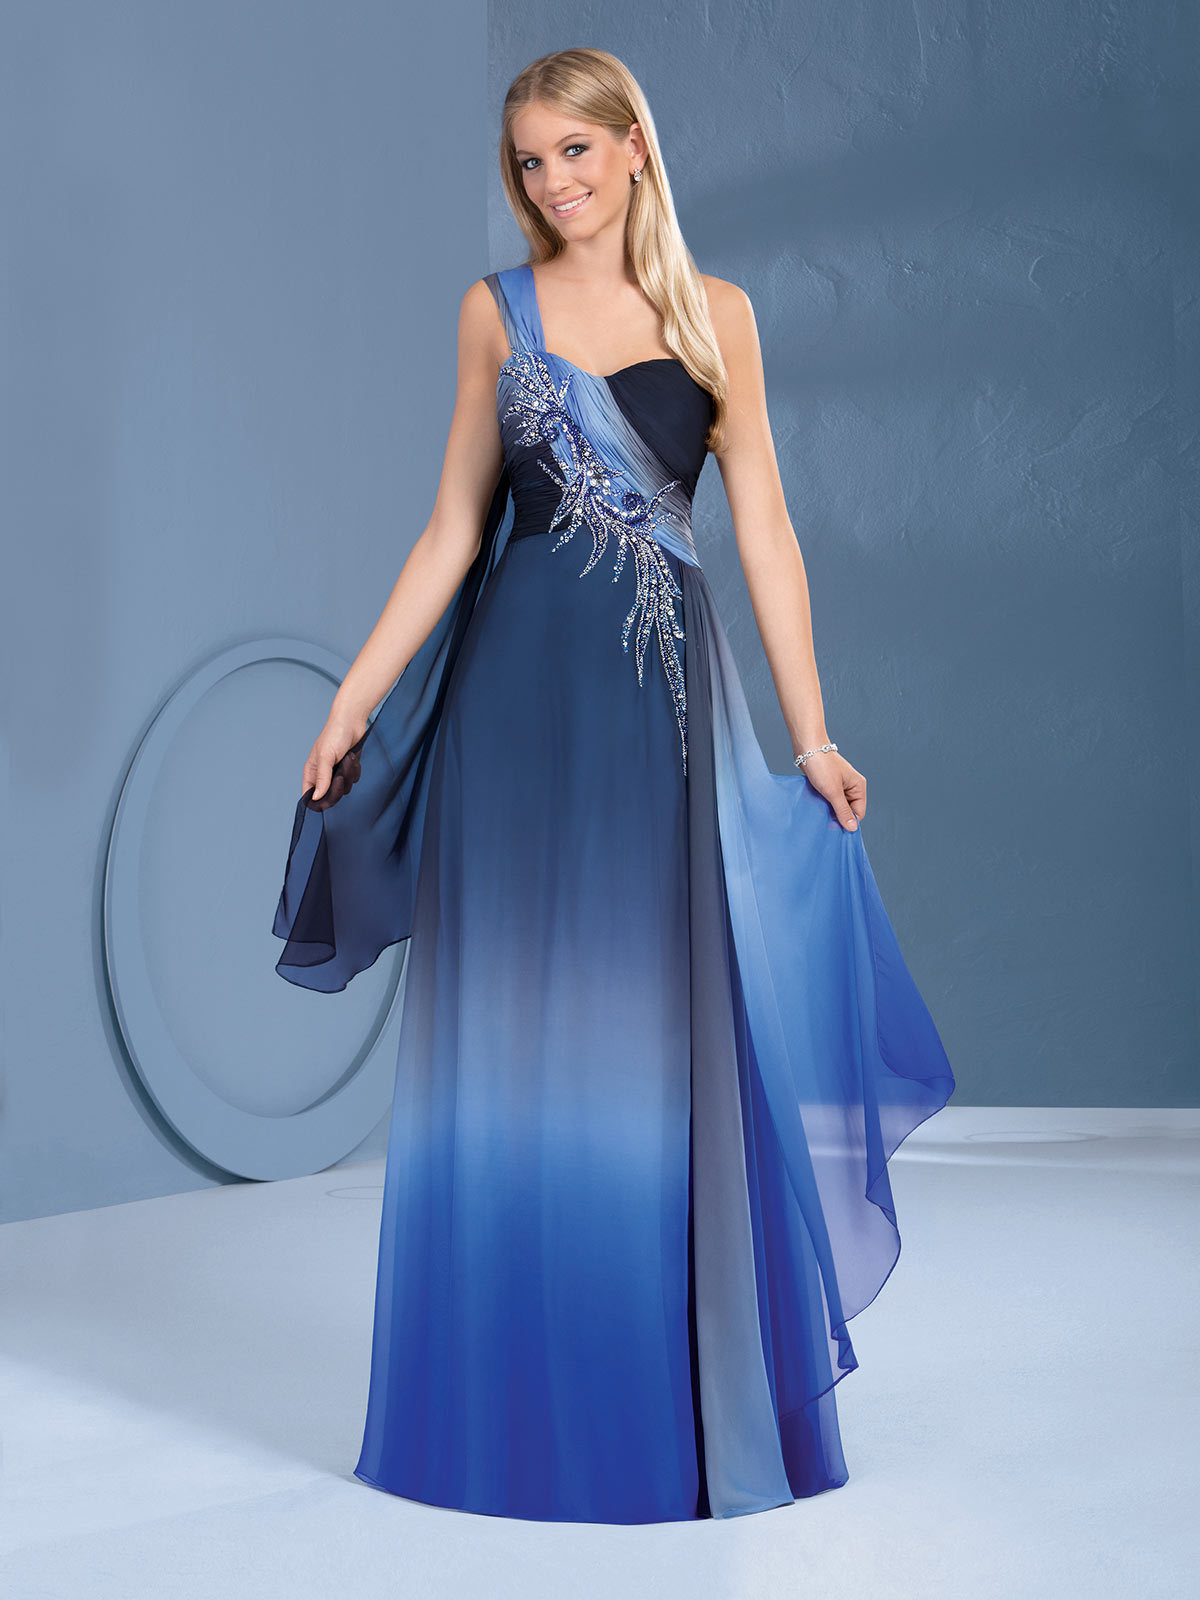 Kleid 22095 Vanity von Kleemeier auf Ja.de